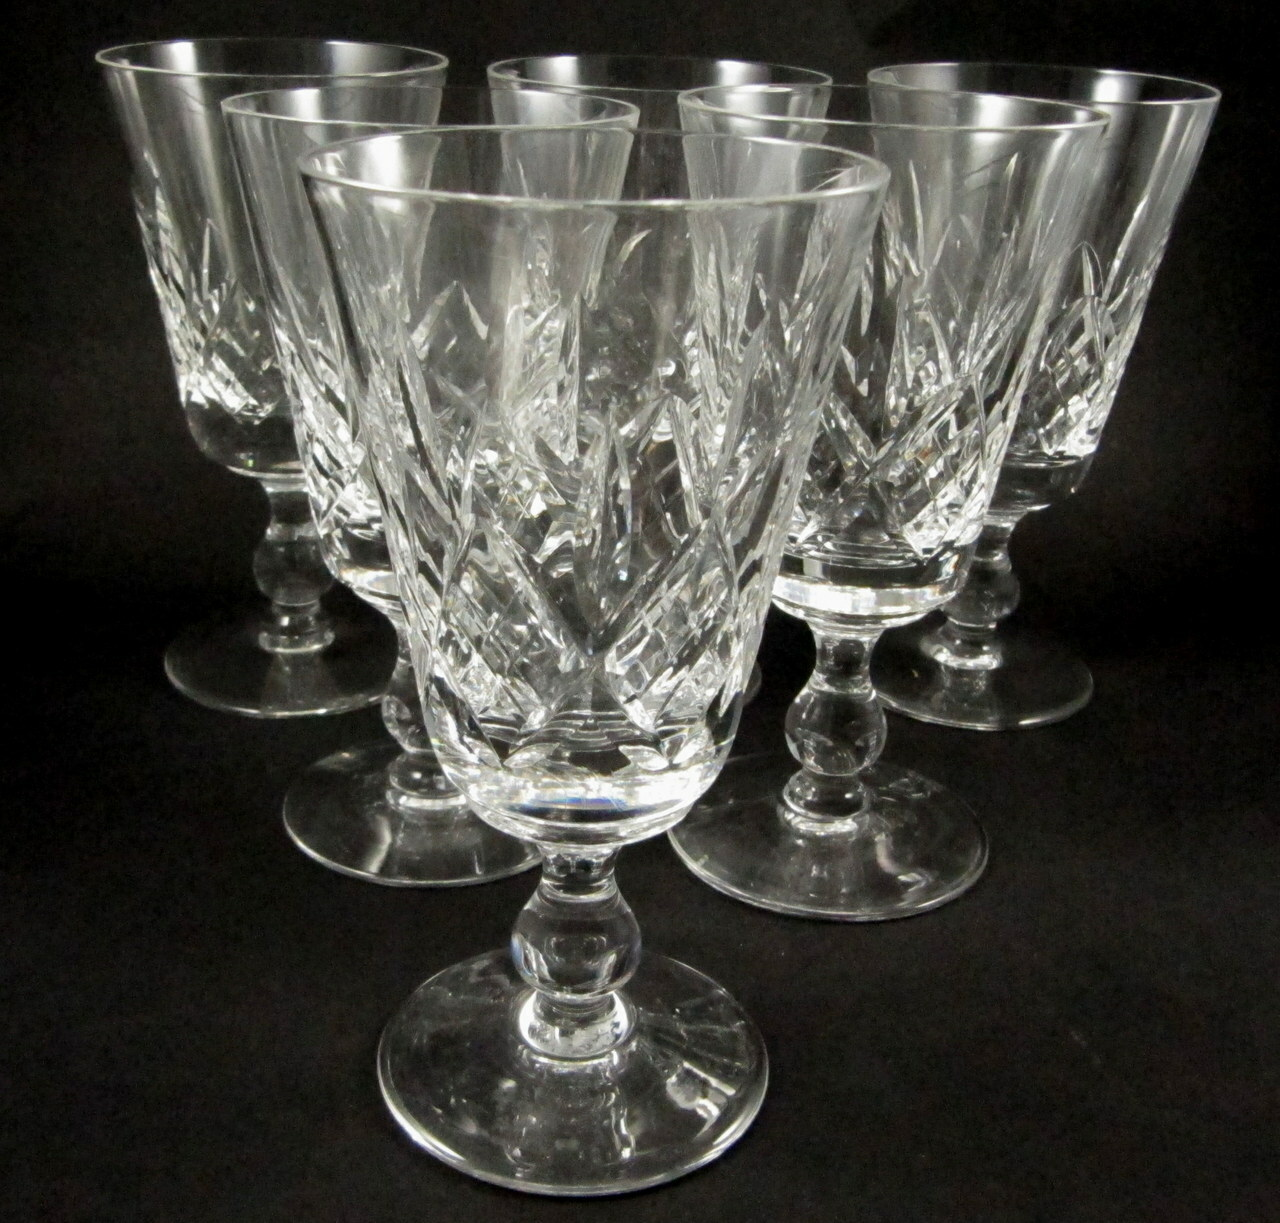 6 Vintage Stuart Crystal Glengarry Red Wine Glasses In Stock